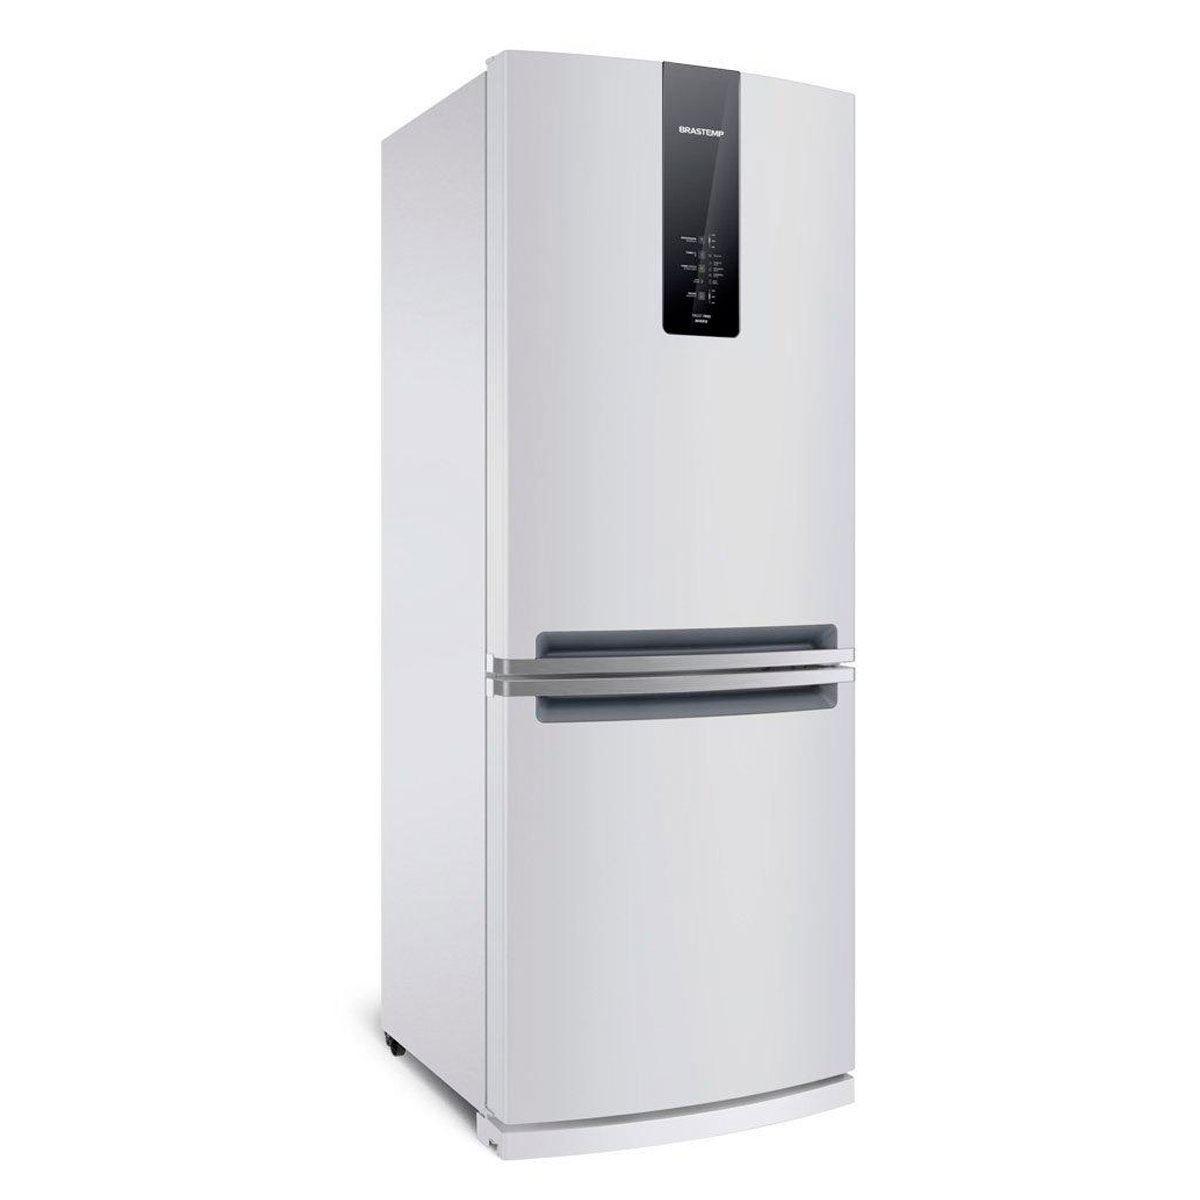 Geladeira Brastemp Frost Free 443 litros Branca - BRE57AB